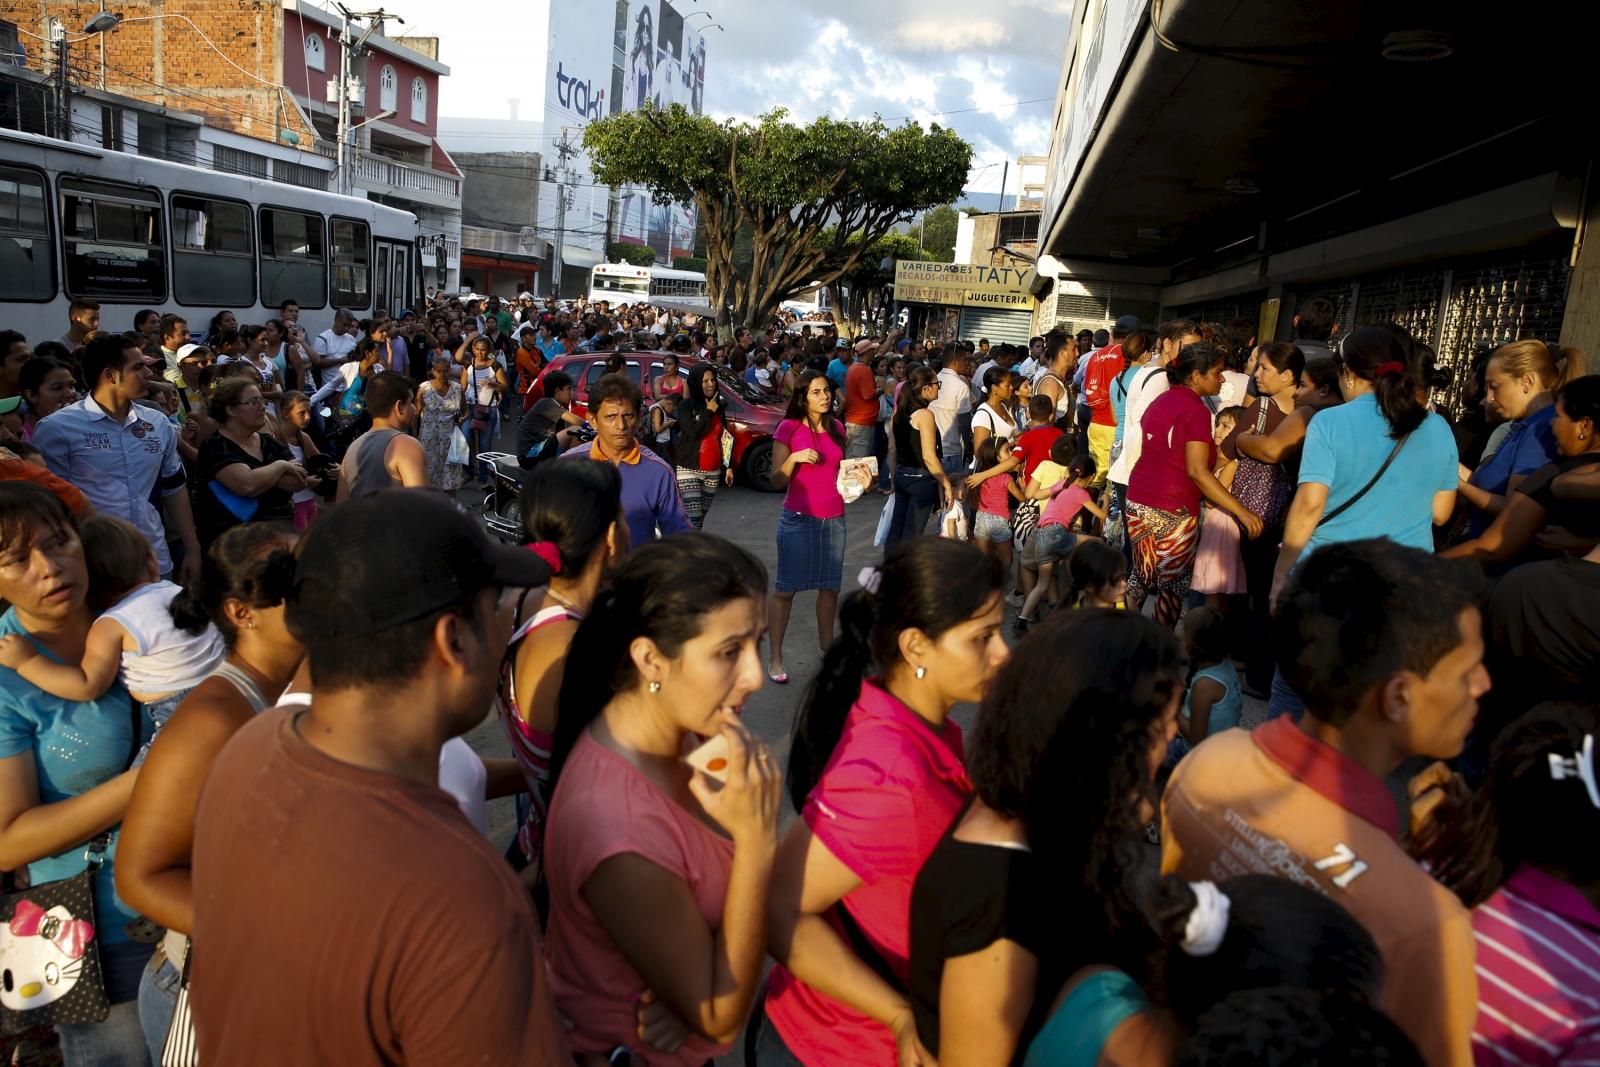 Venezuela food crisis